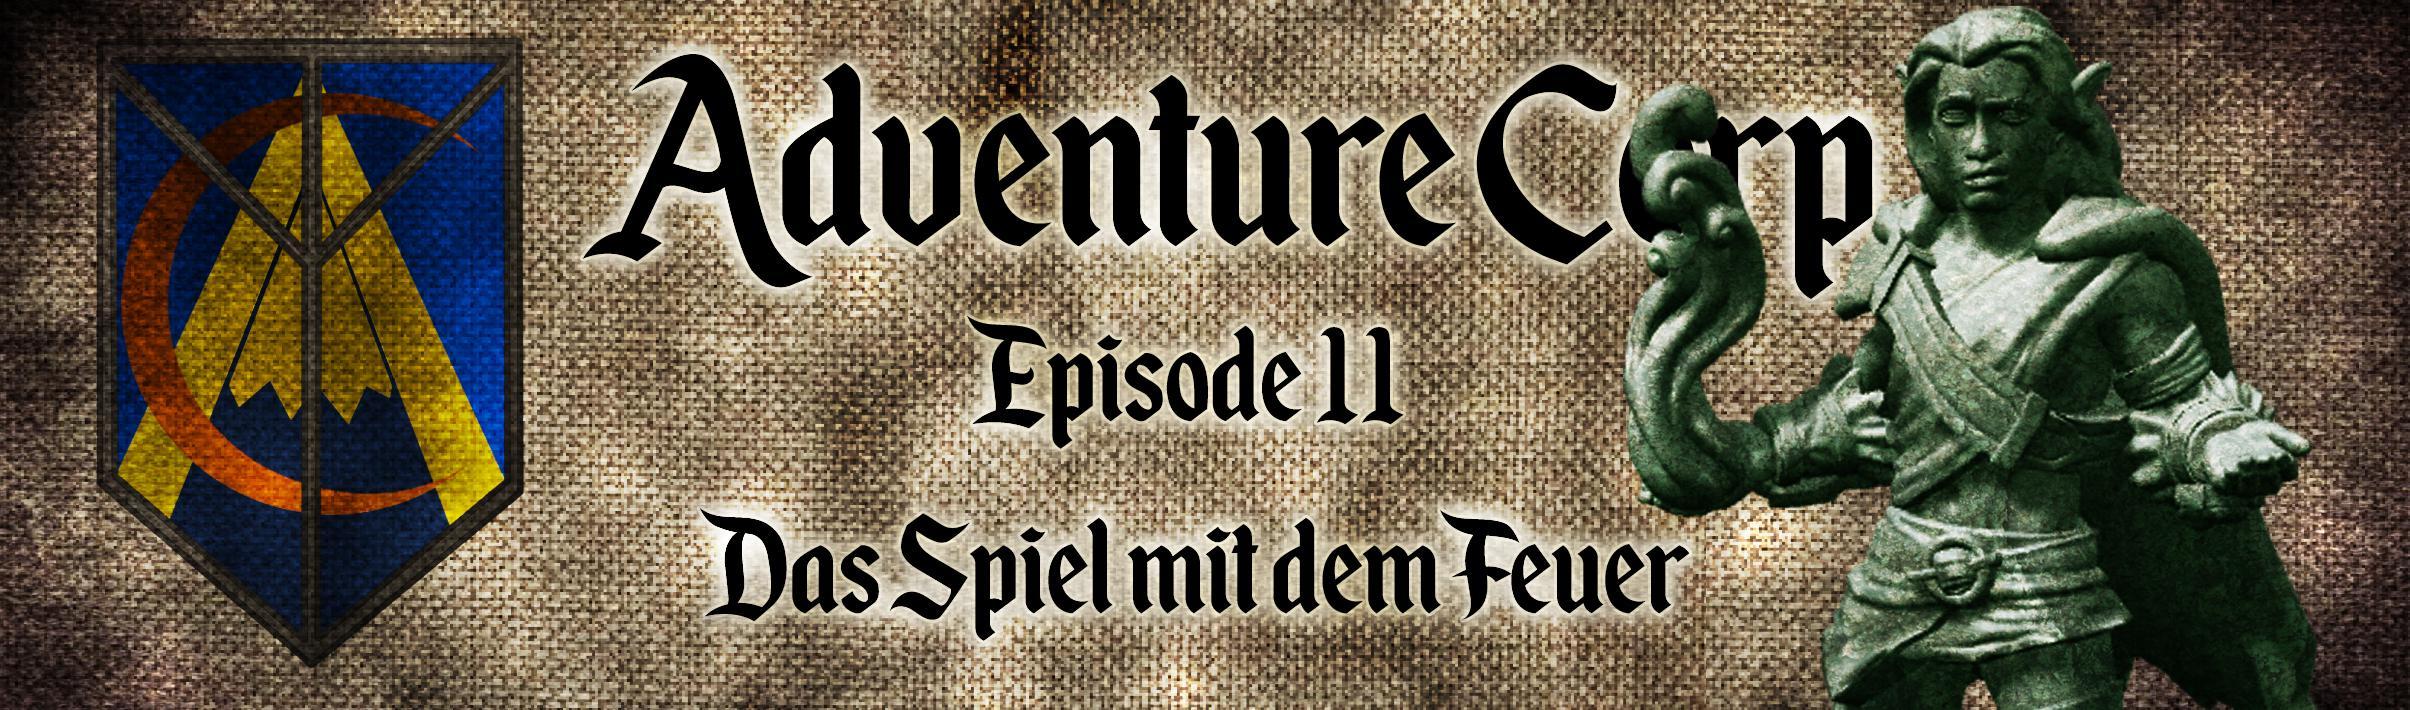 Adventure Corp - Banner Episode 11